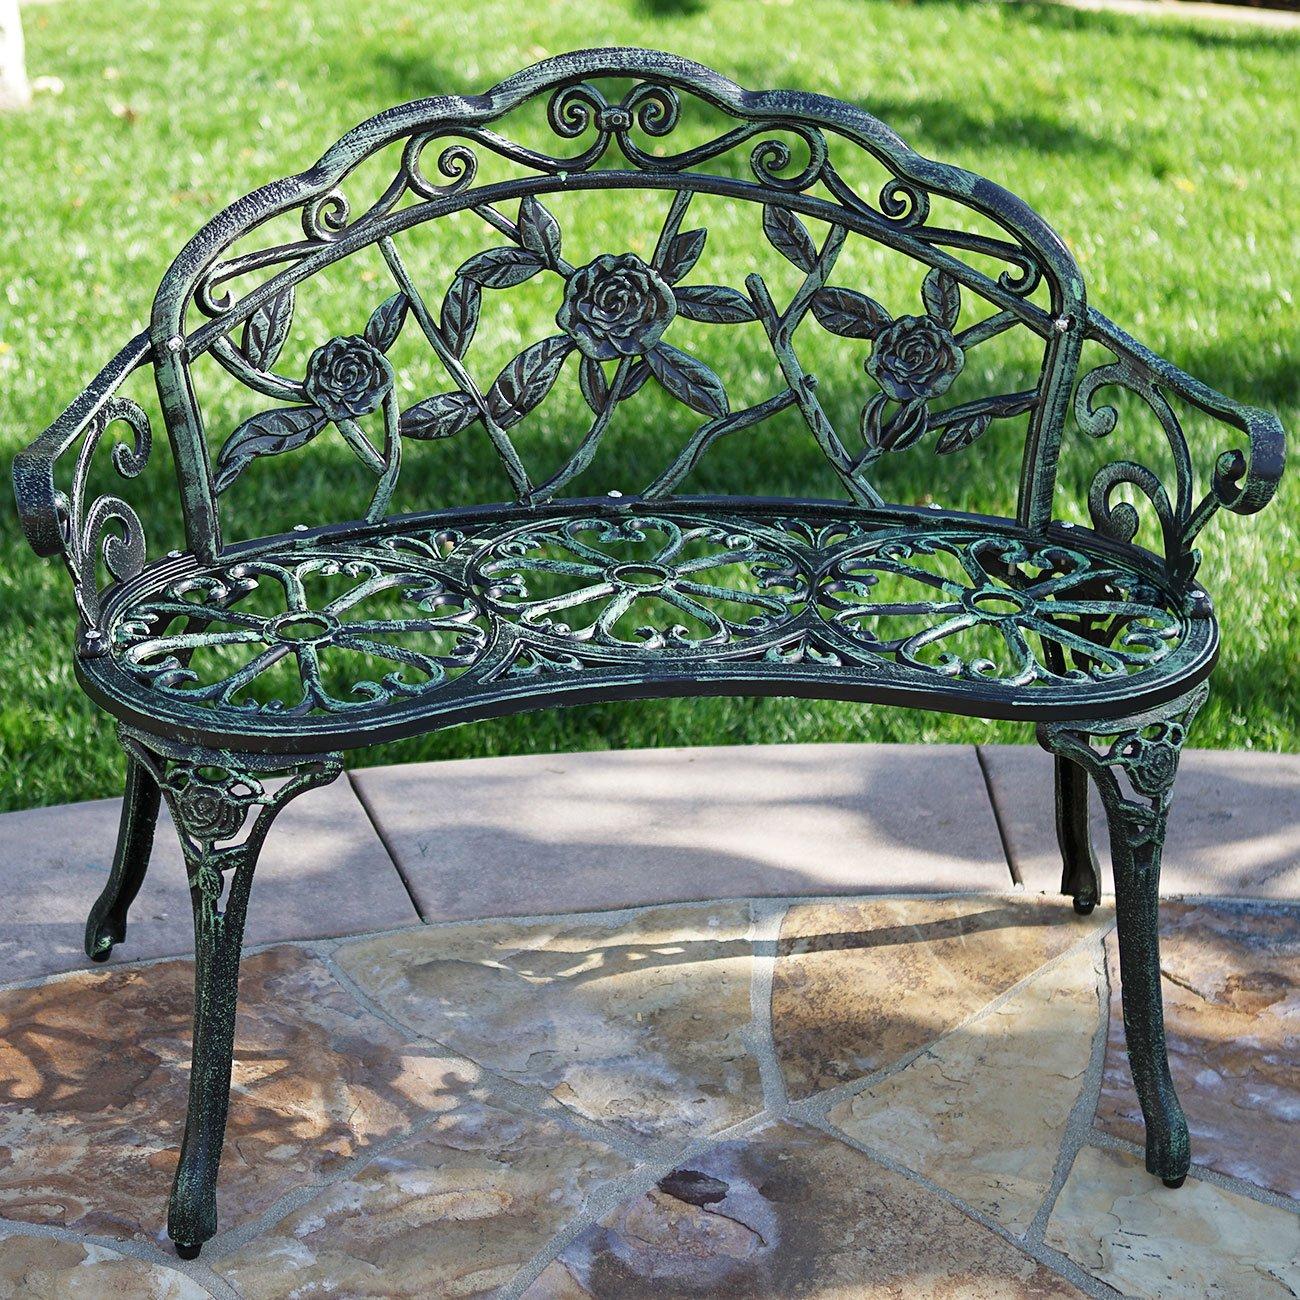 Belleze Cast Iron Antique Rose Style Design Outdoor Patio Garden Park Bench, Green 0